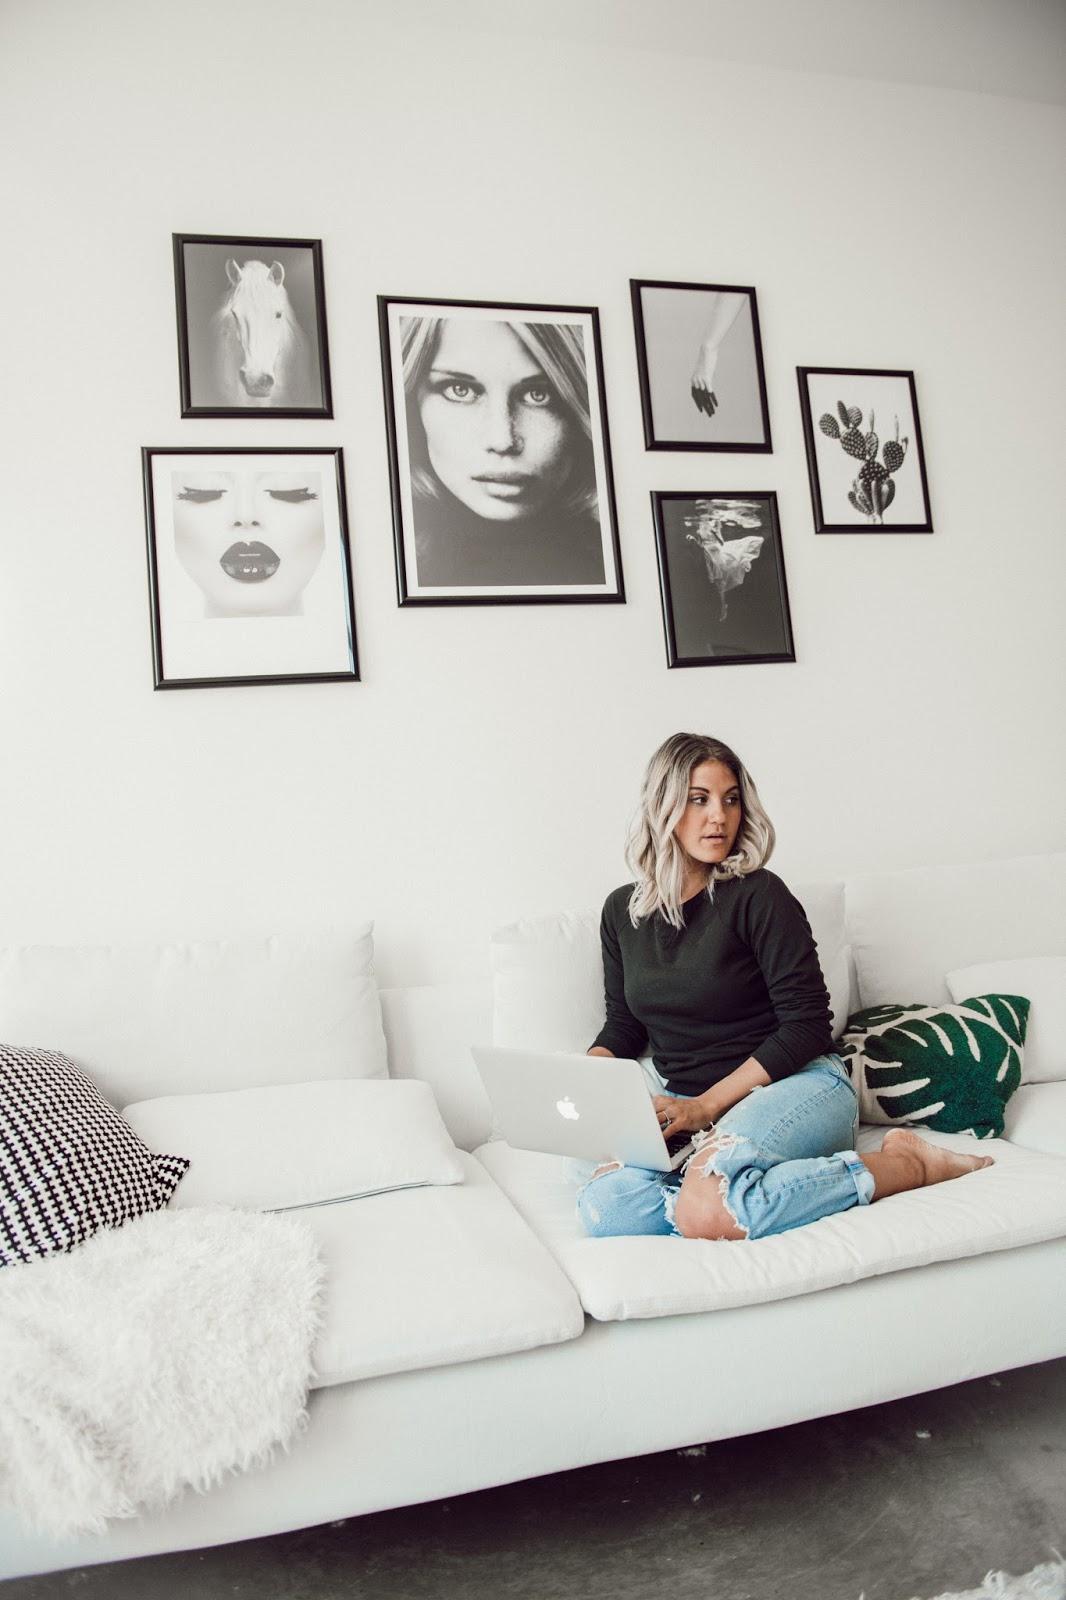 Modern Gallery Wall Inspo - @taylorwinkelmeyer